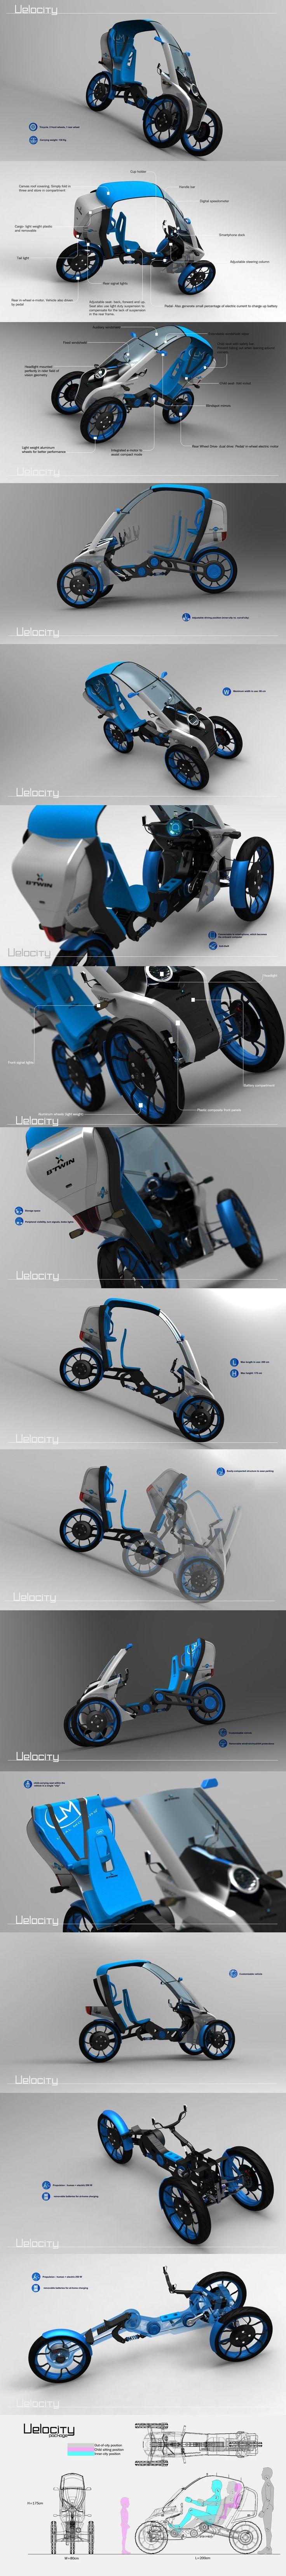 VELOCITY B'TWIN velomobile concept design by John Buhasa